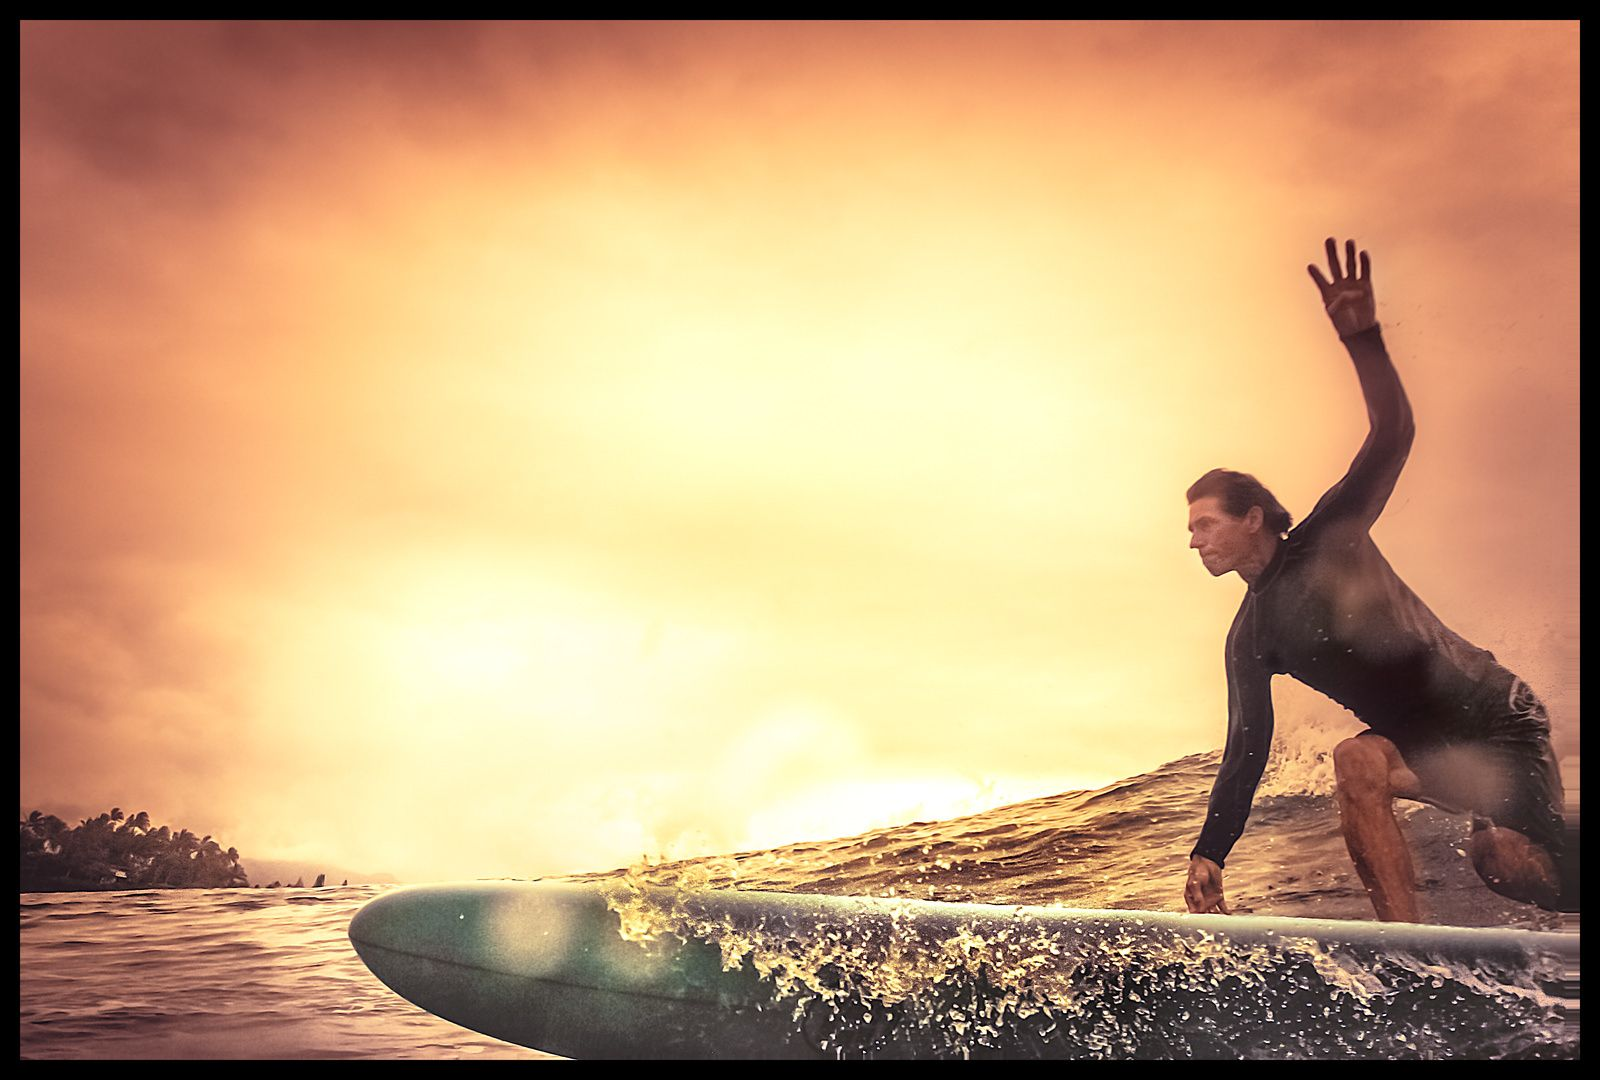 Surfer, Chun's Reef